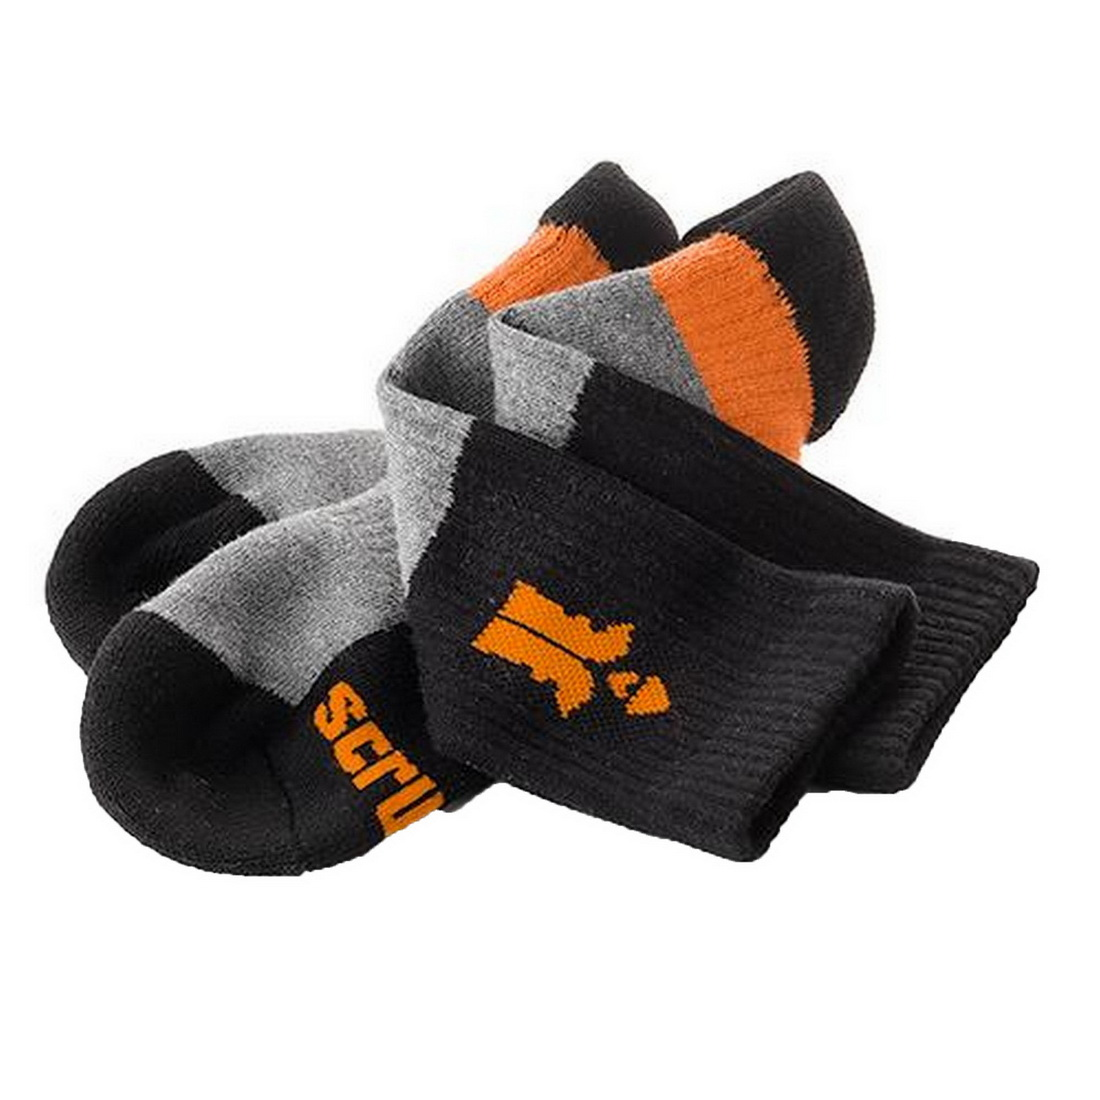 Trade Series Work Socks UK7-9.5 Black/Orange T53547